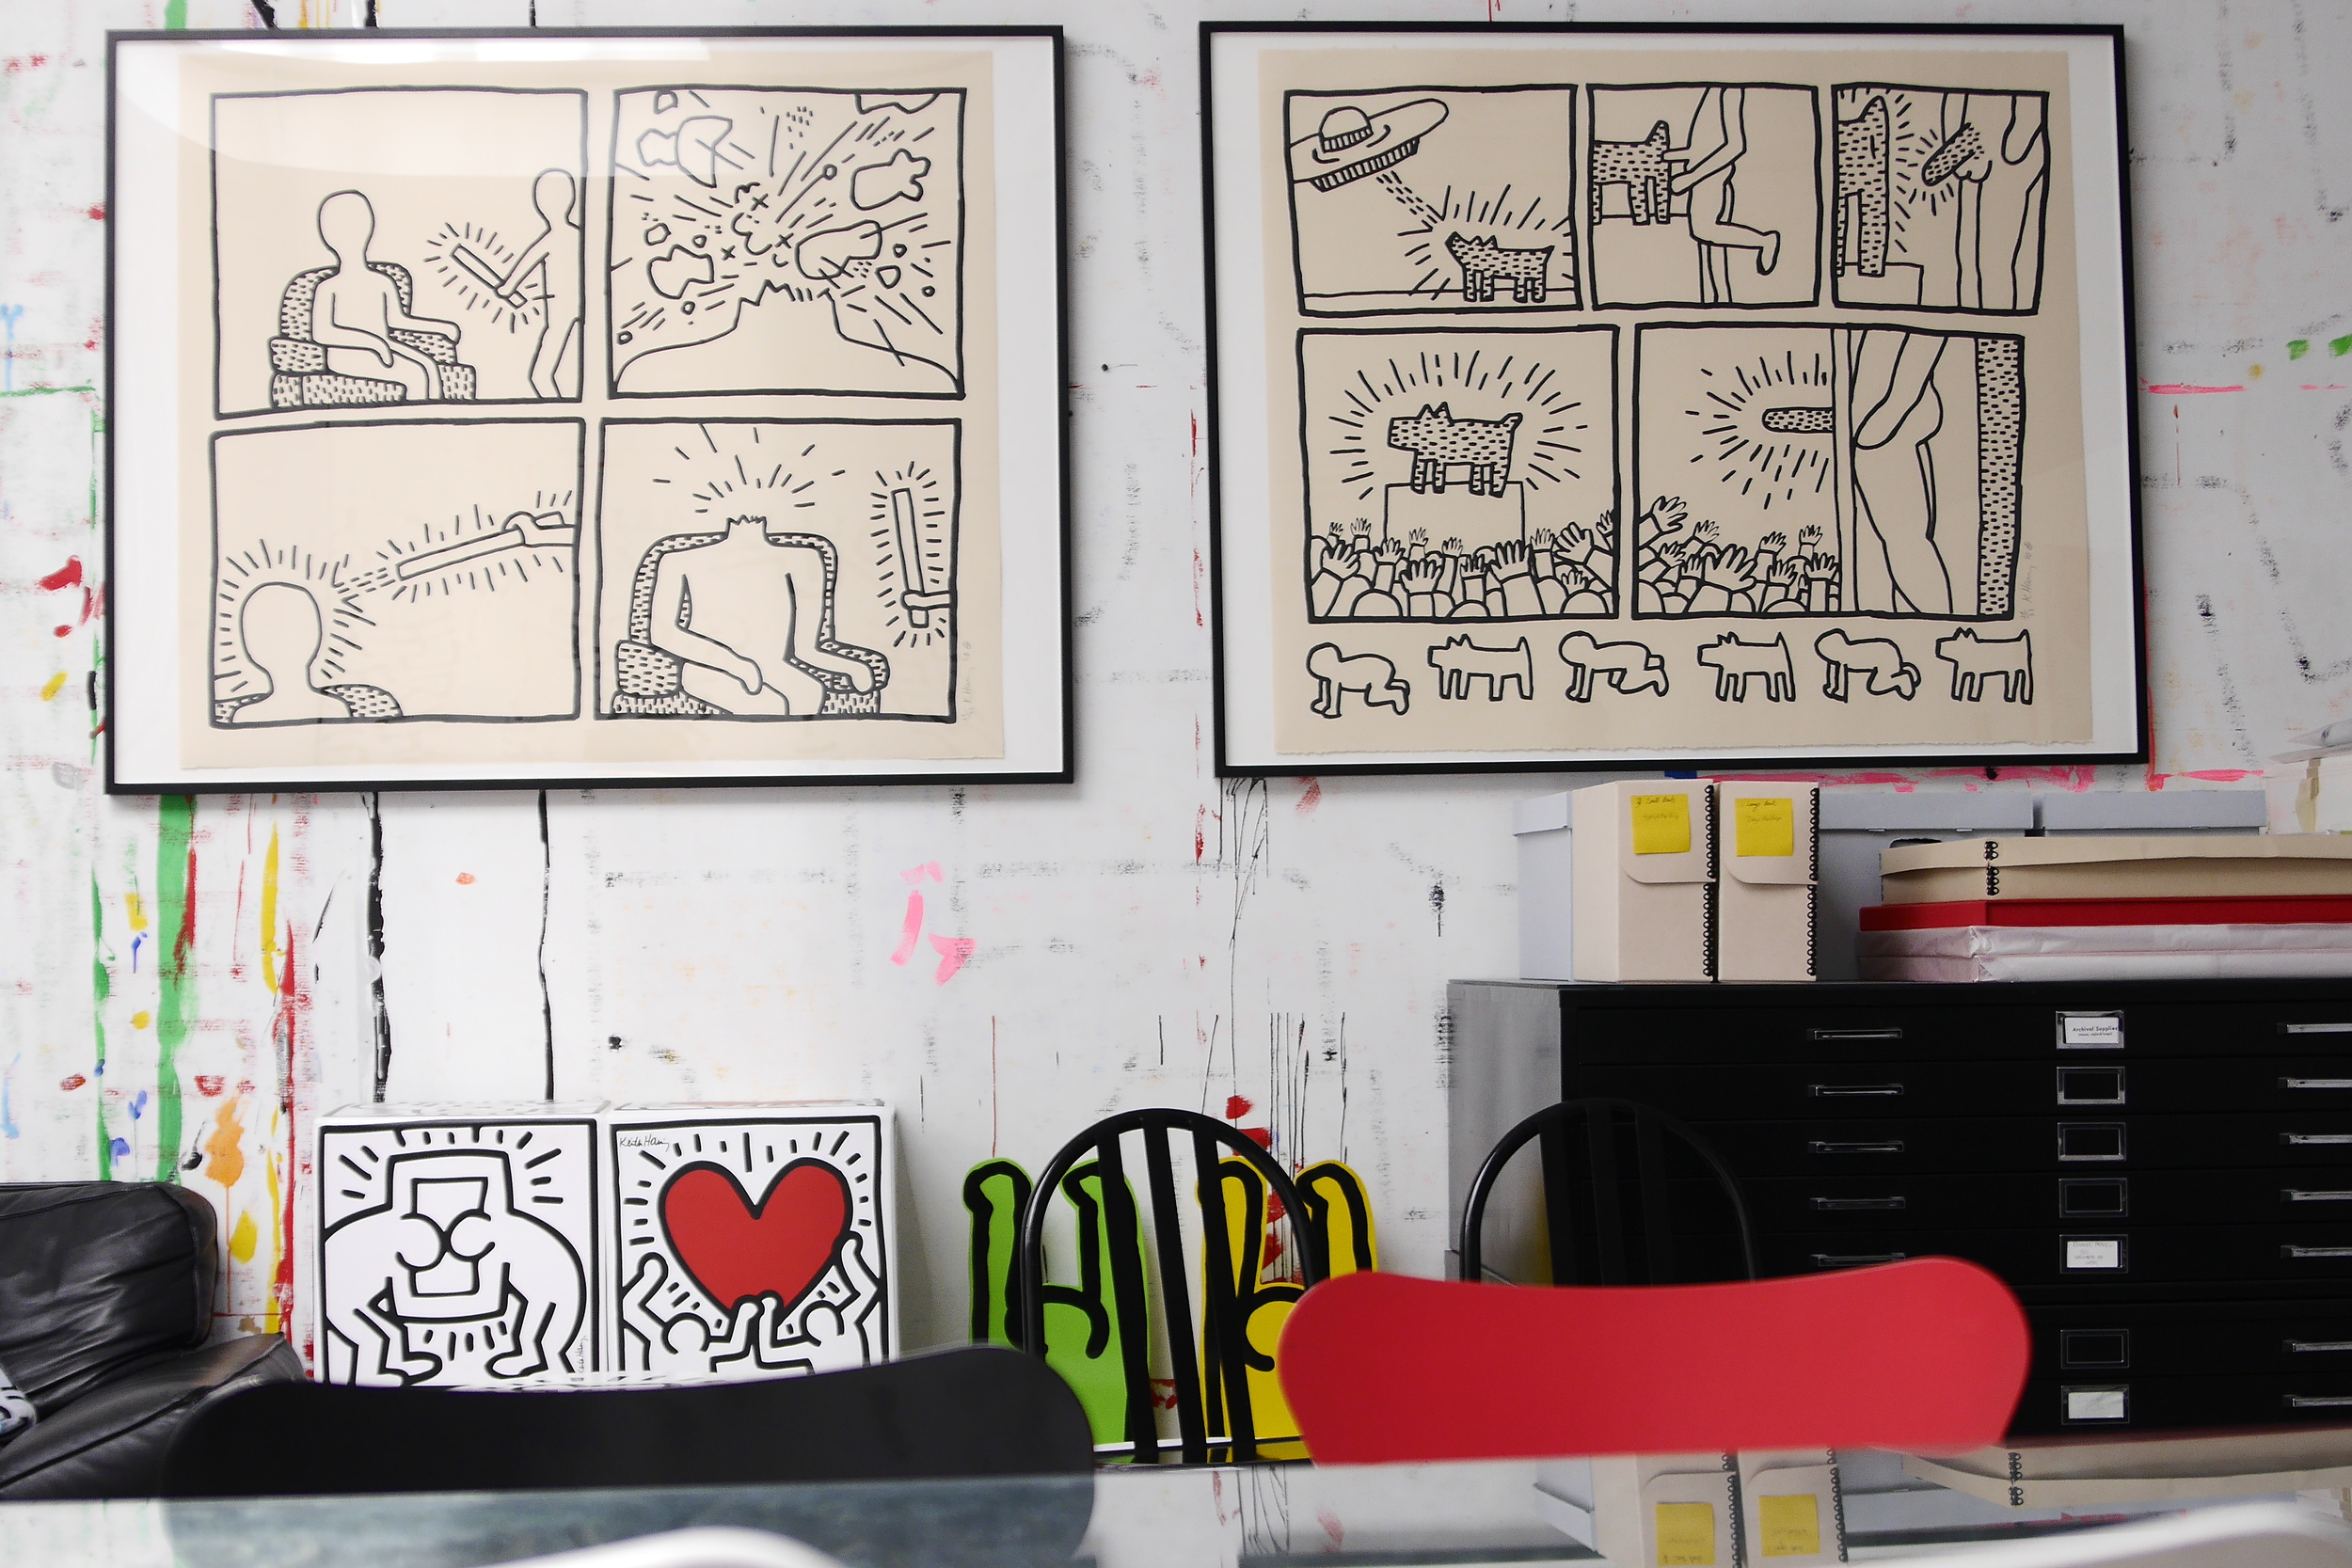 Maria-Brito_Keith-Haring-Foundation-4.jpg